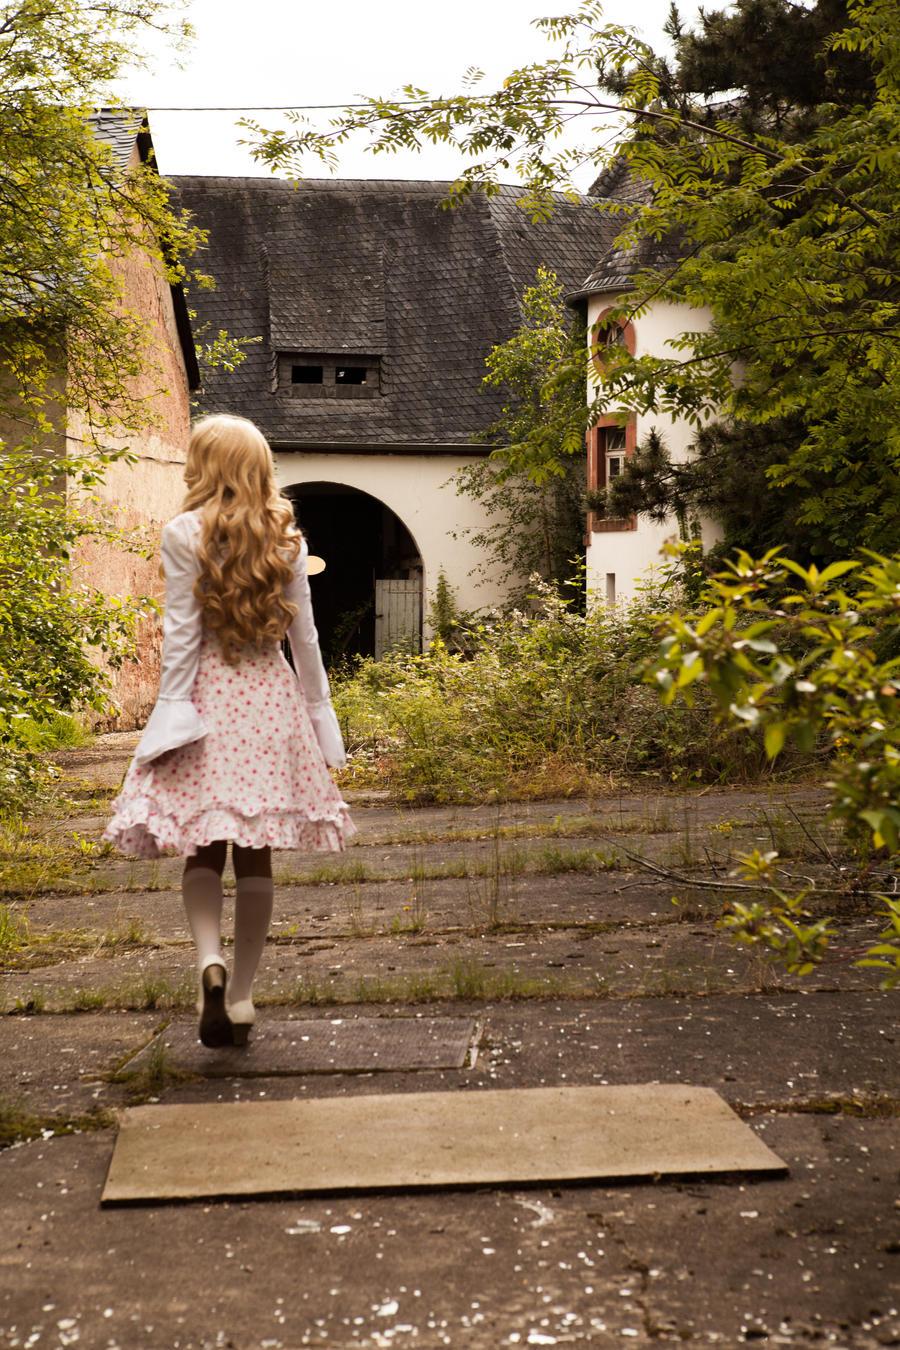 Walking into the past by JigokuNatsuNeko